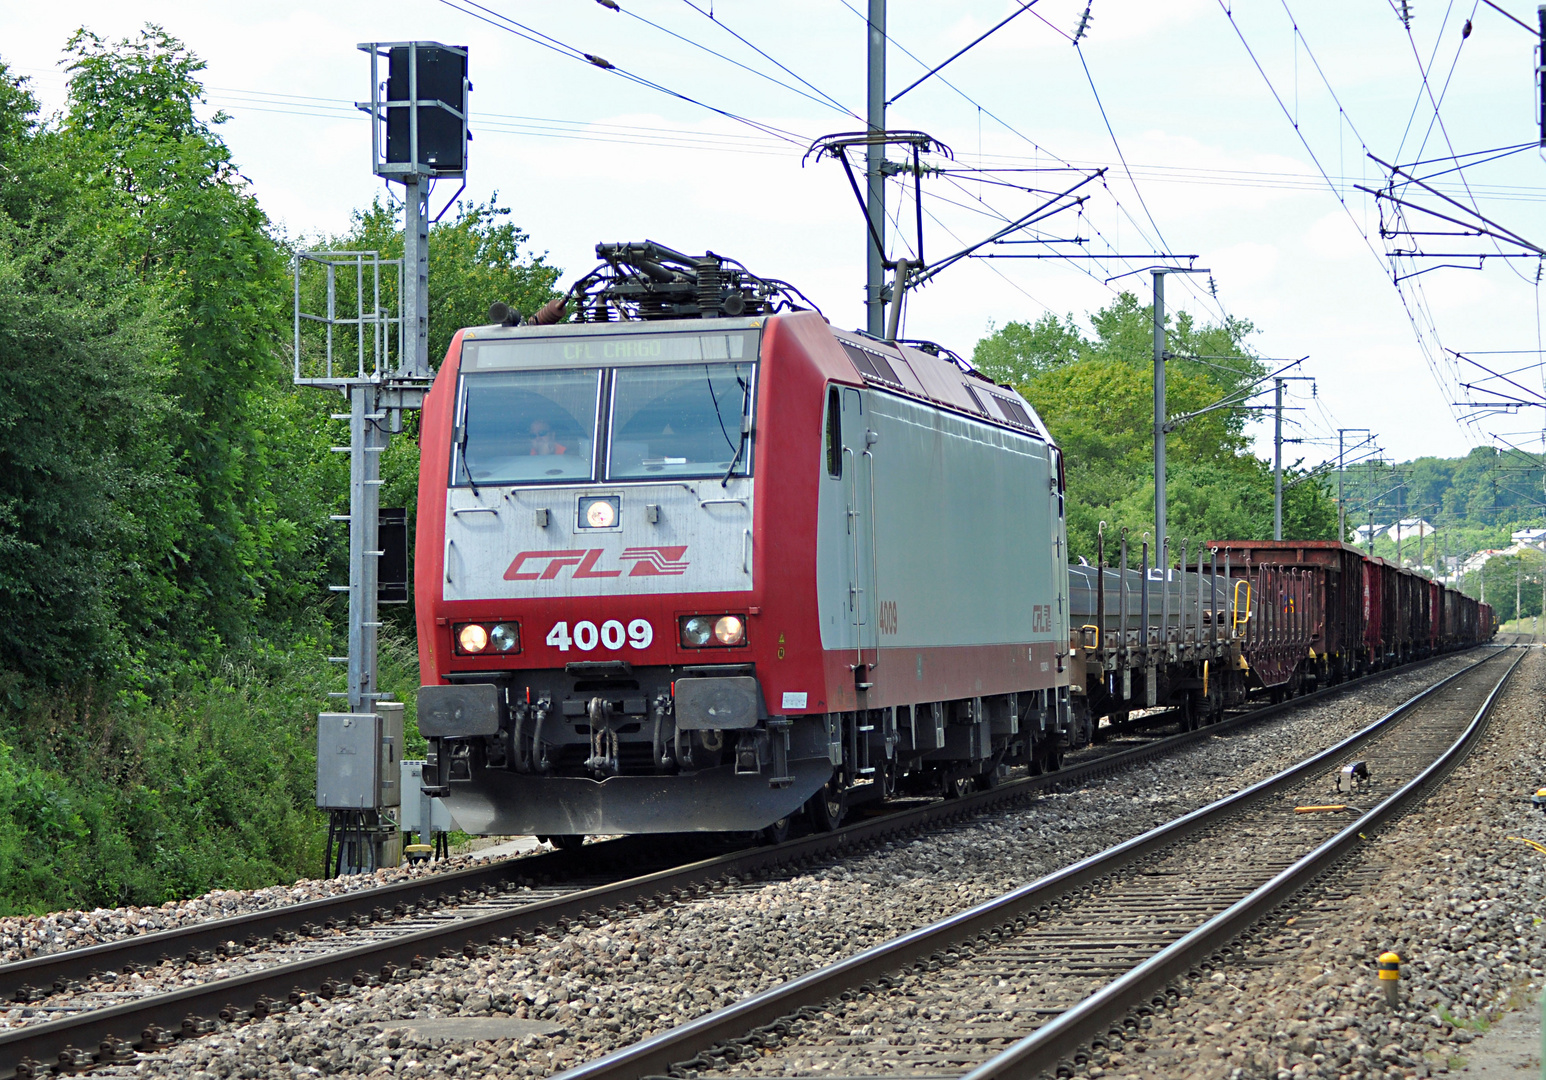 CFL 4009